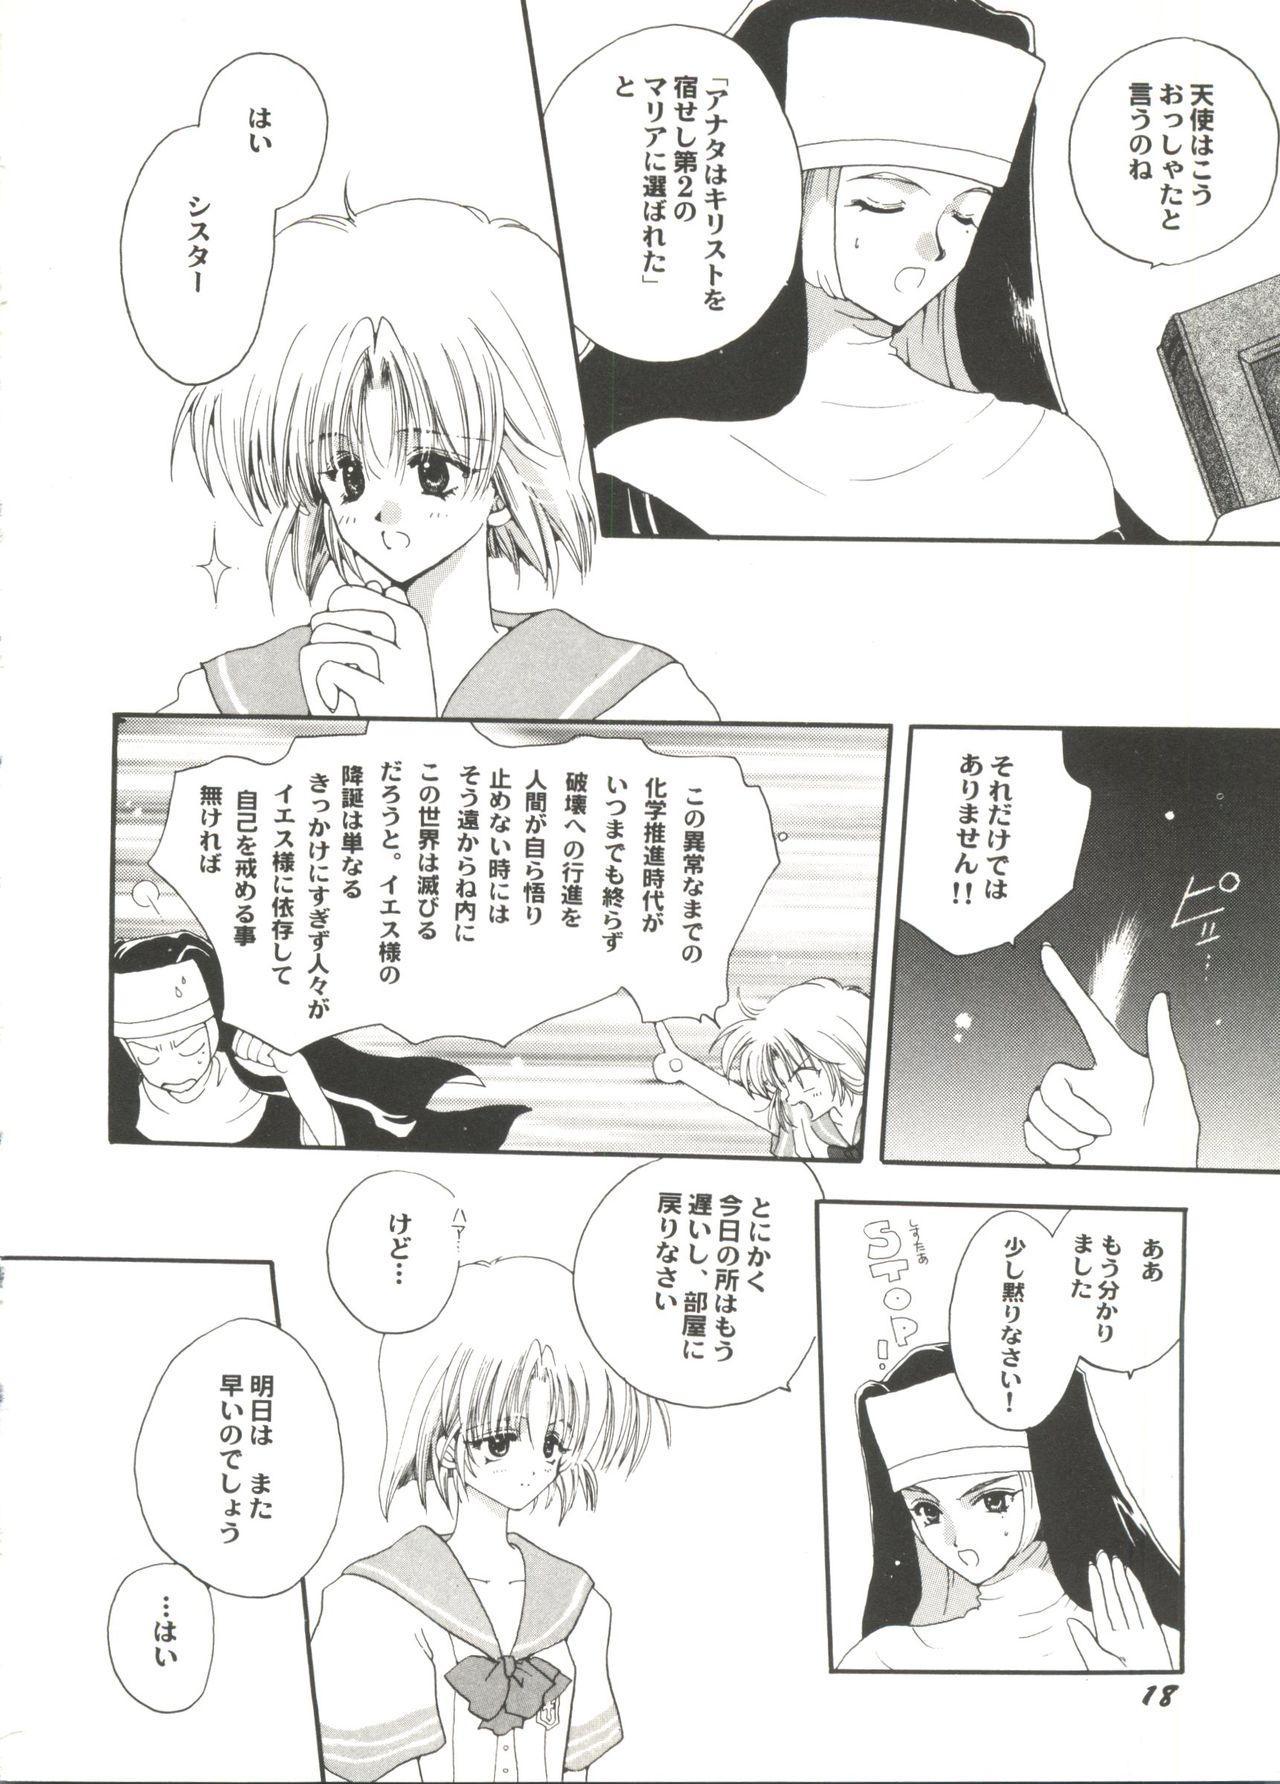 Bishoujo Doujin Peach Club - Pretty Gal's Fanzine Peach Club 9 19